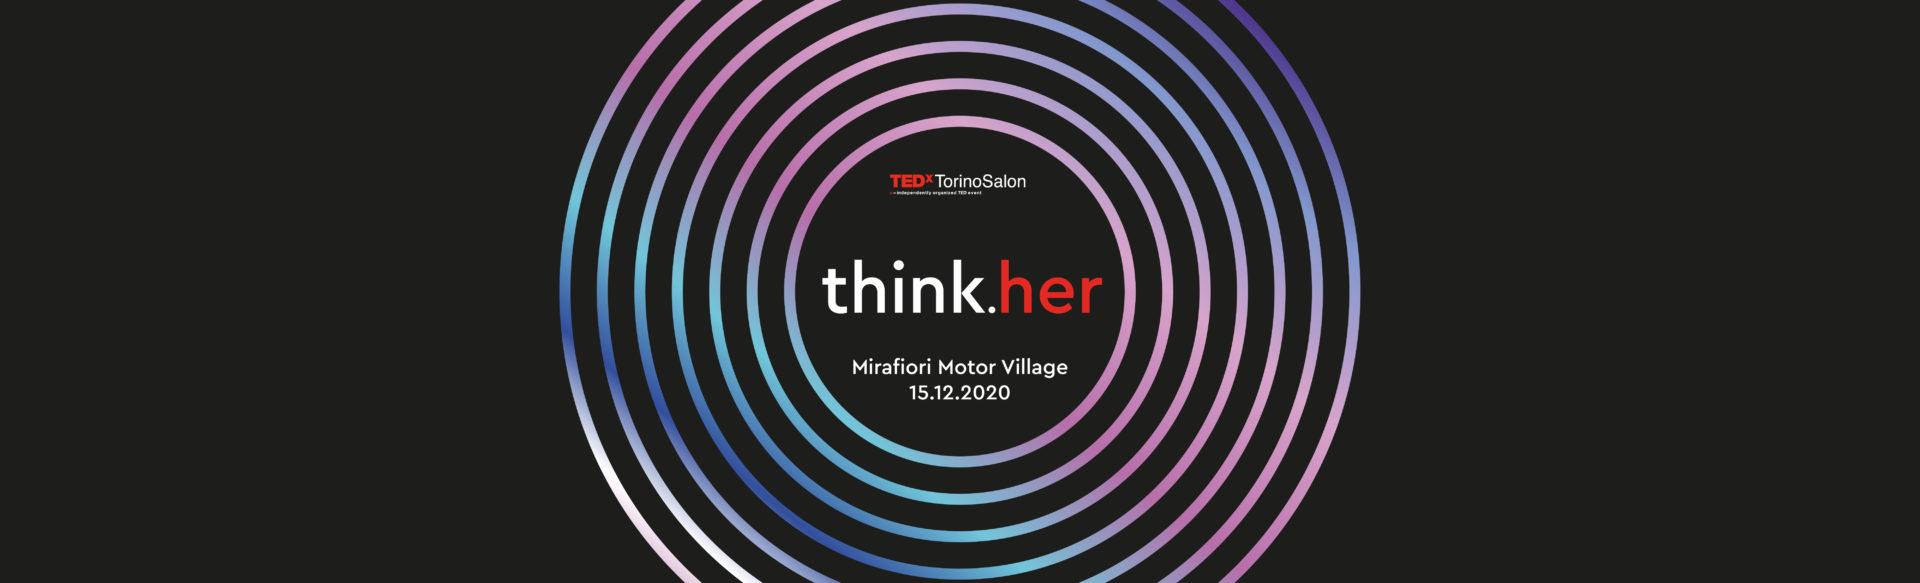 TEDxTorinoSalon think.her